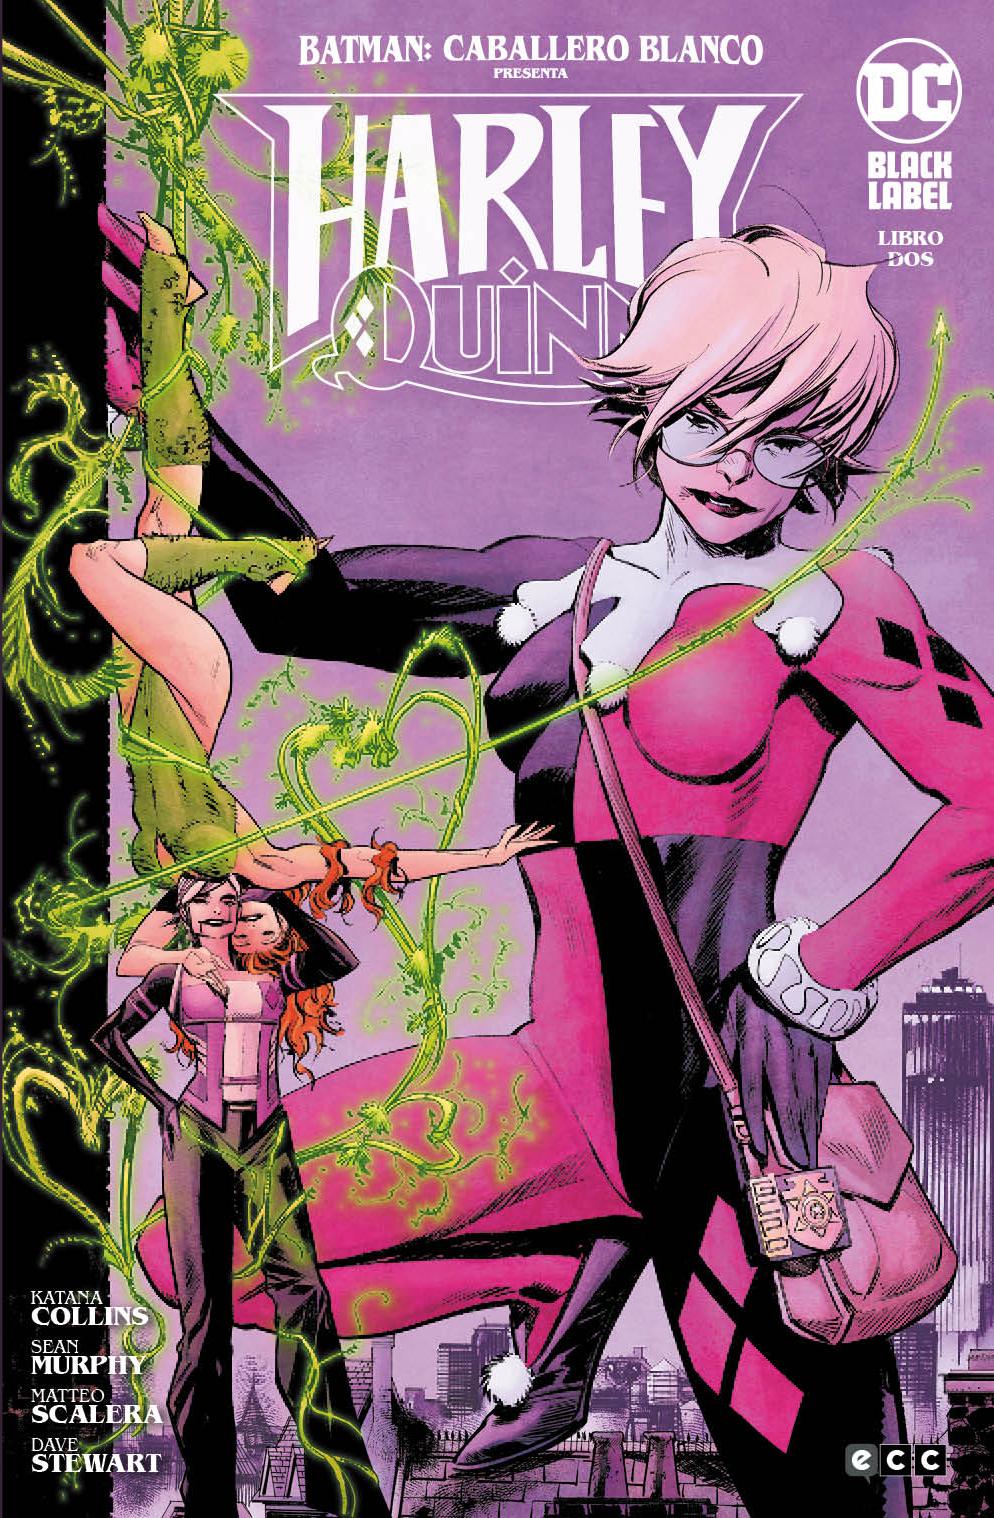 Batman: Caballero Blanco presenta - Harley Quinn núm. 02 de 6